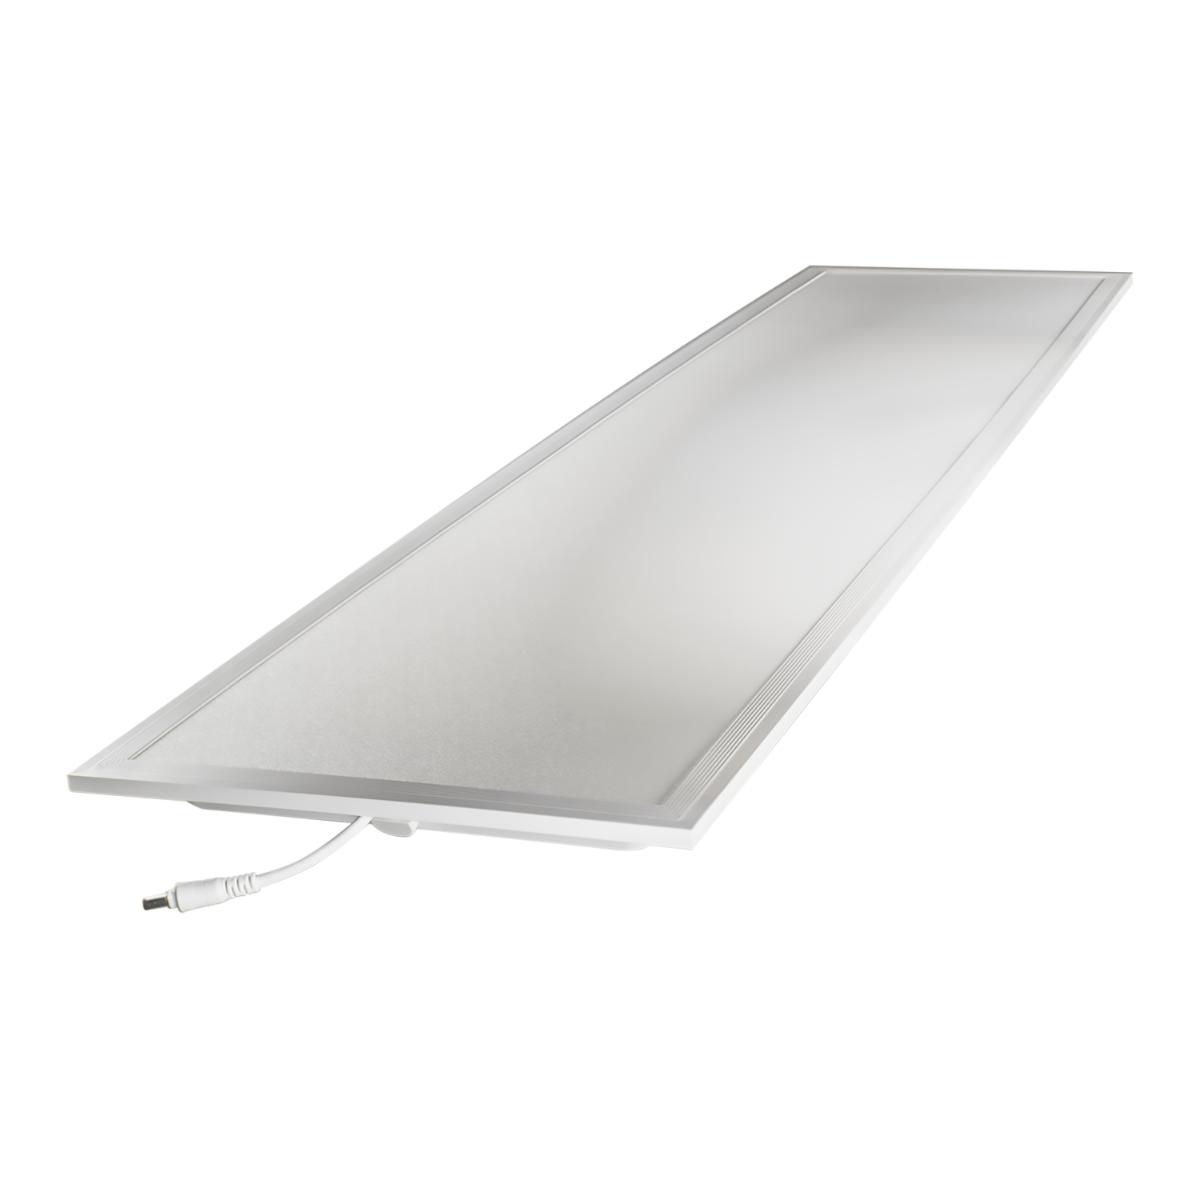 Noxion Delta Pro LED Paneeli UGR<19 V2.0 30W 4110lm 6500K 300x1200 + GST18 Uros + Xitanium | Päivänvalo Valkoinen